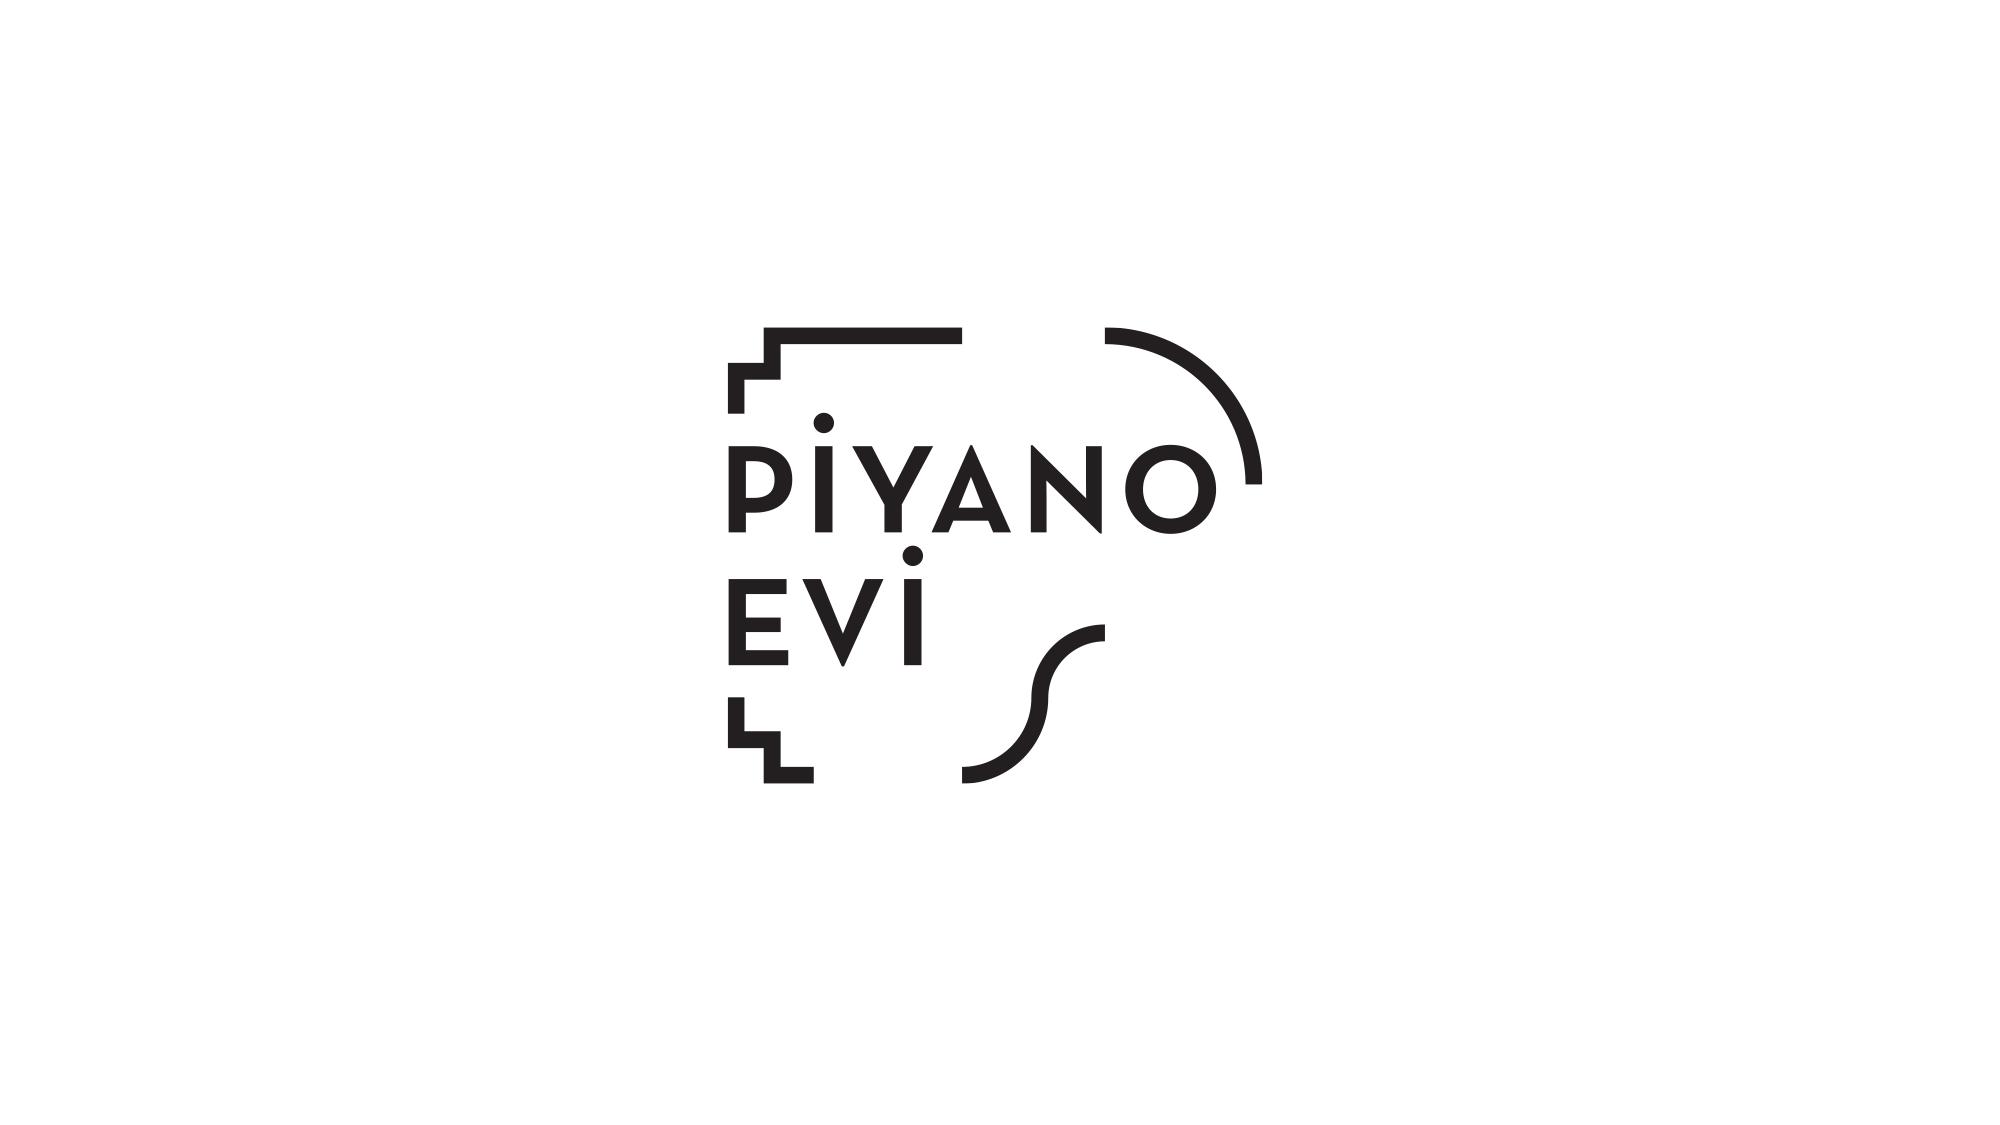 Piyano_03b